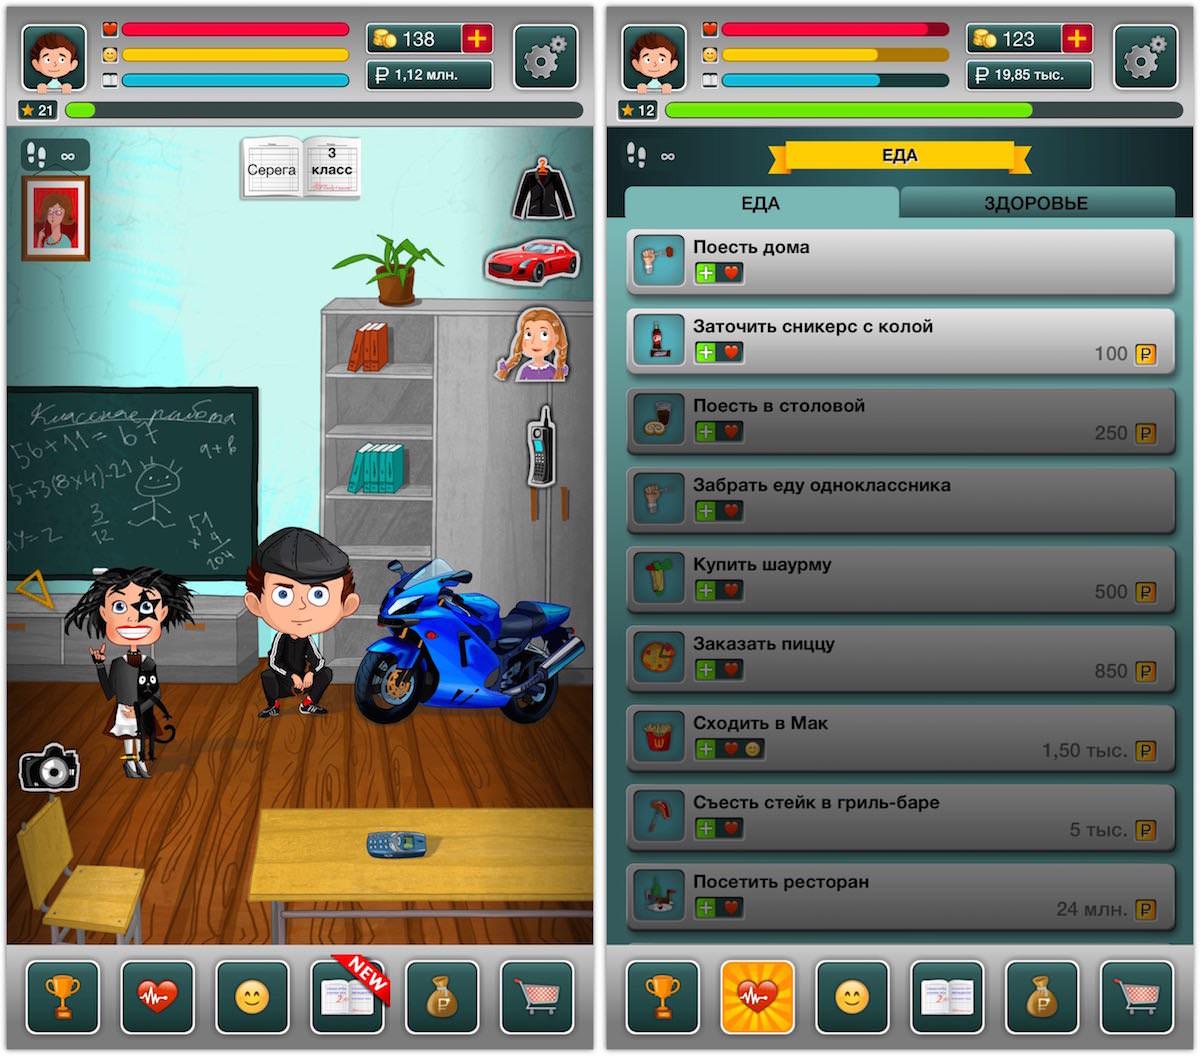 школьник симулятор Russia iOS iPhone iPad App Store 0